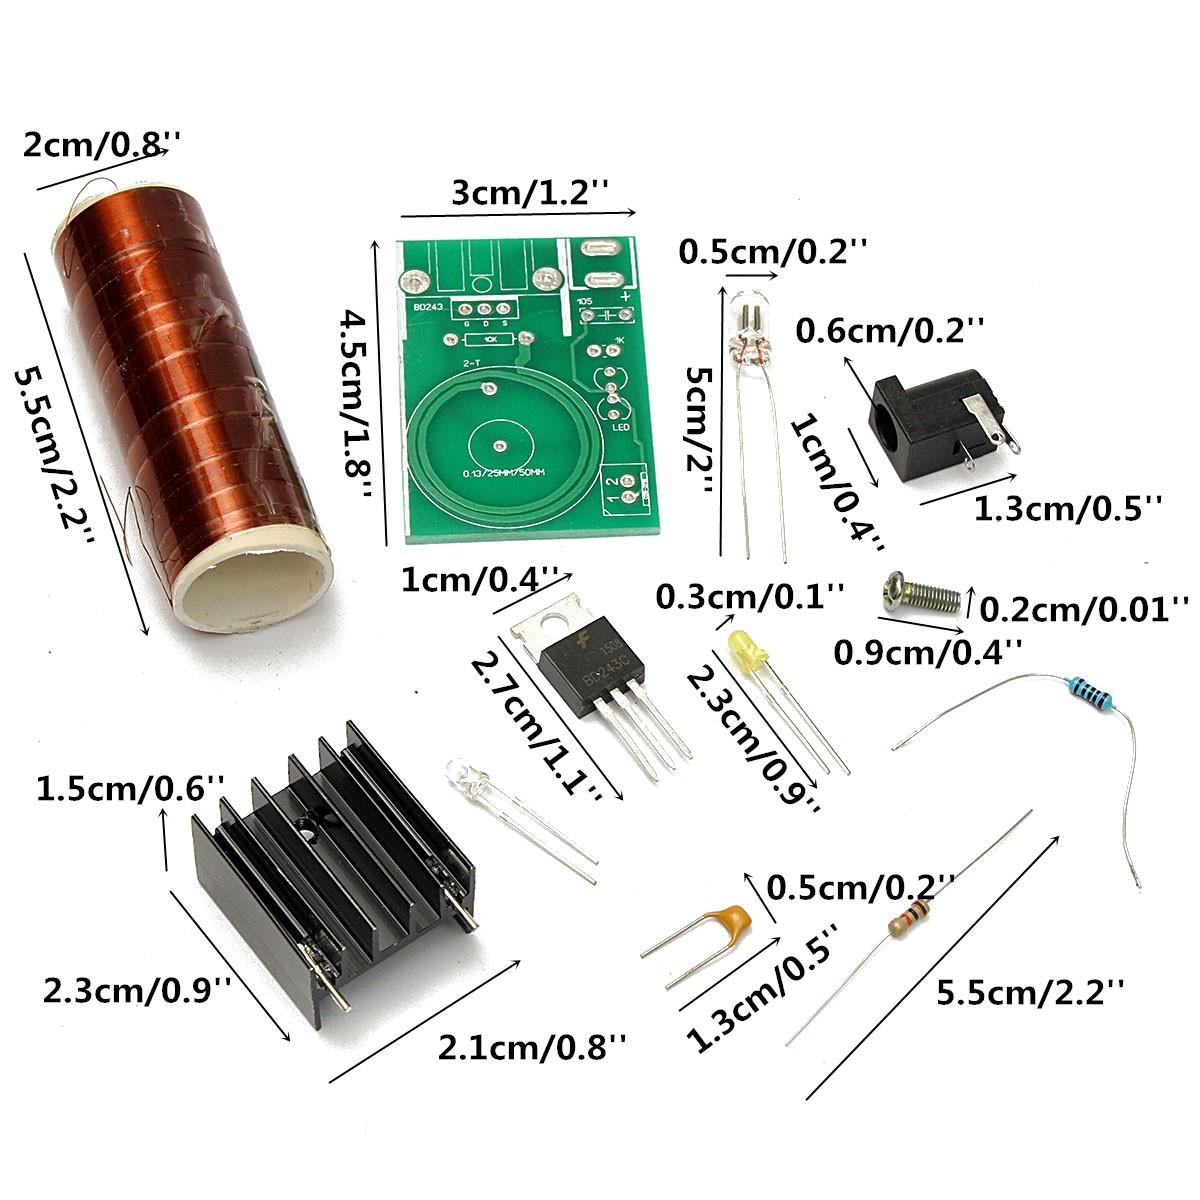 12V DC Mini DIY Tesla Coil Kit Arc Wireless Electric Power Transmission  Lighting | PrestoMall - Body Moisturisers